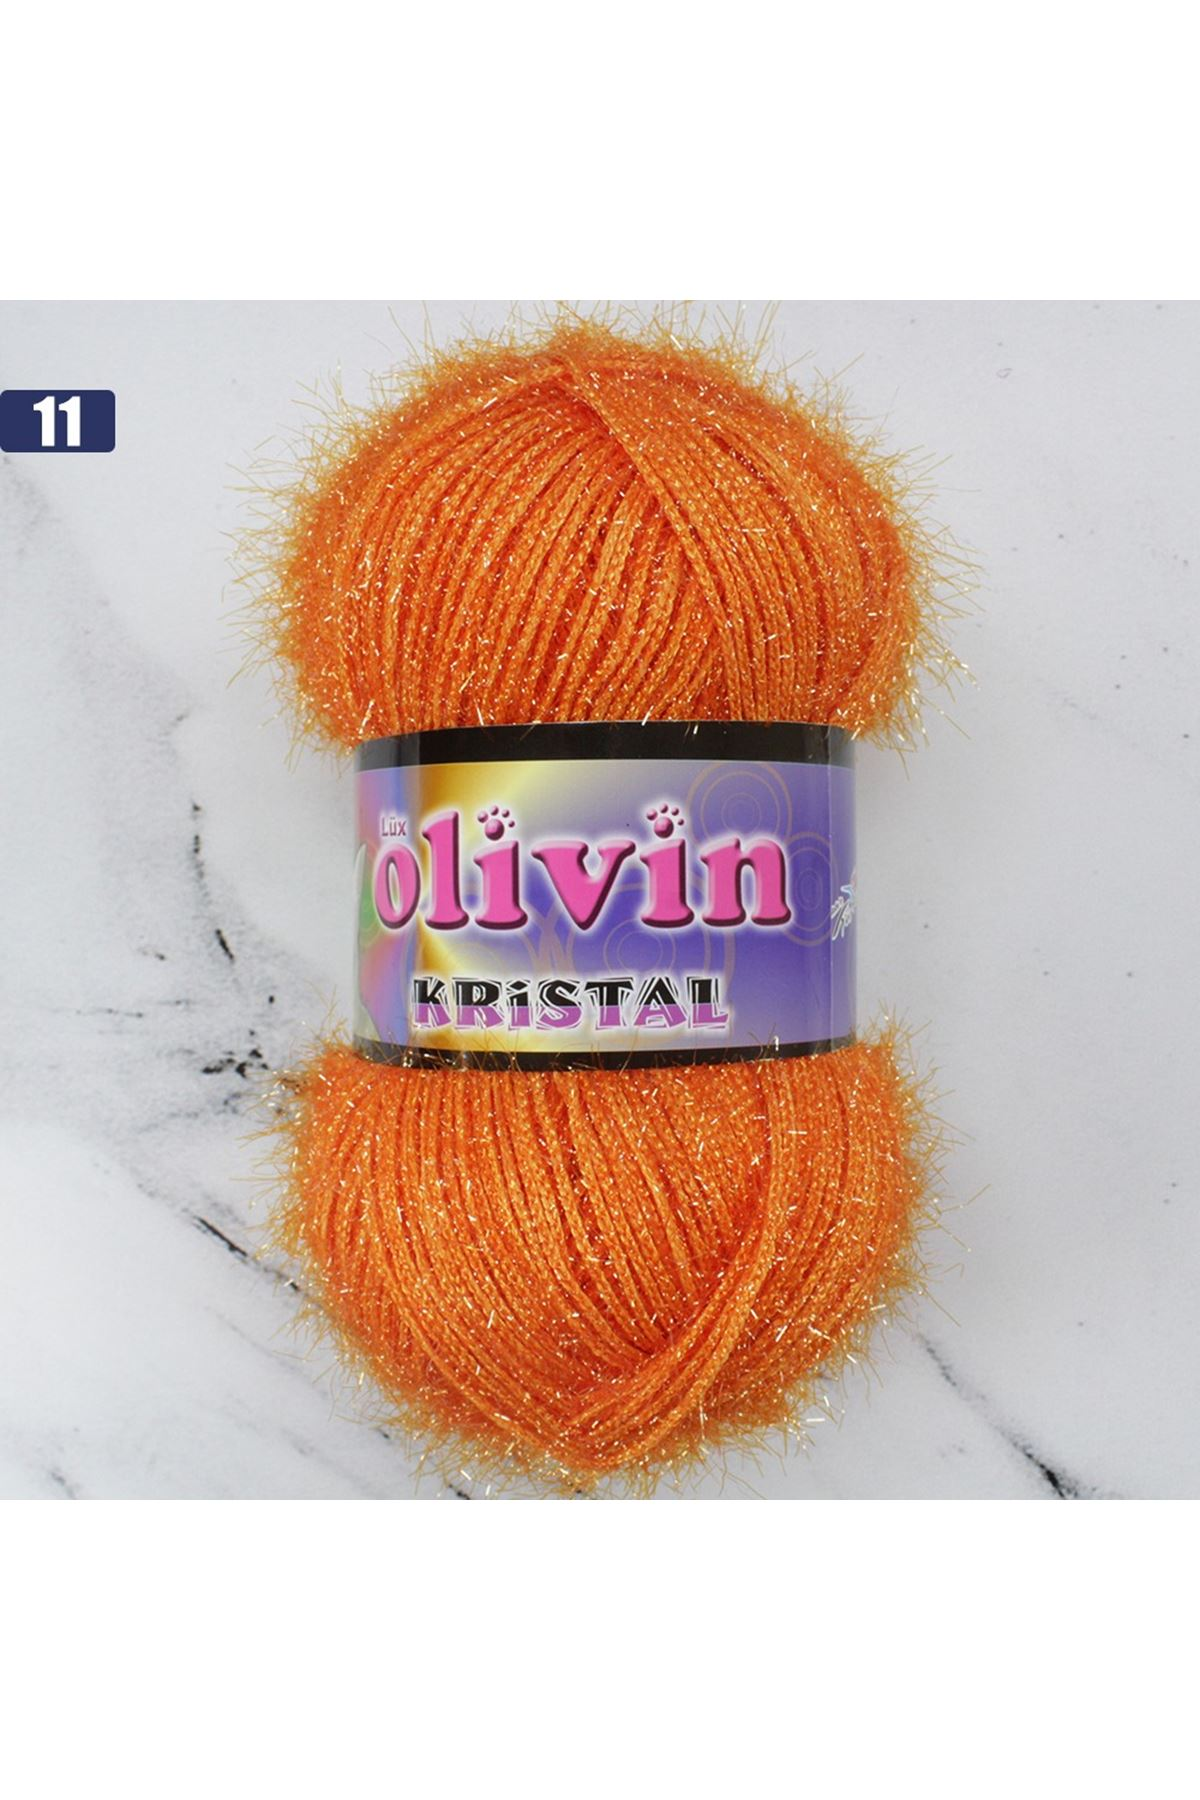 Olivin Simli Kristal  - 11